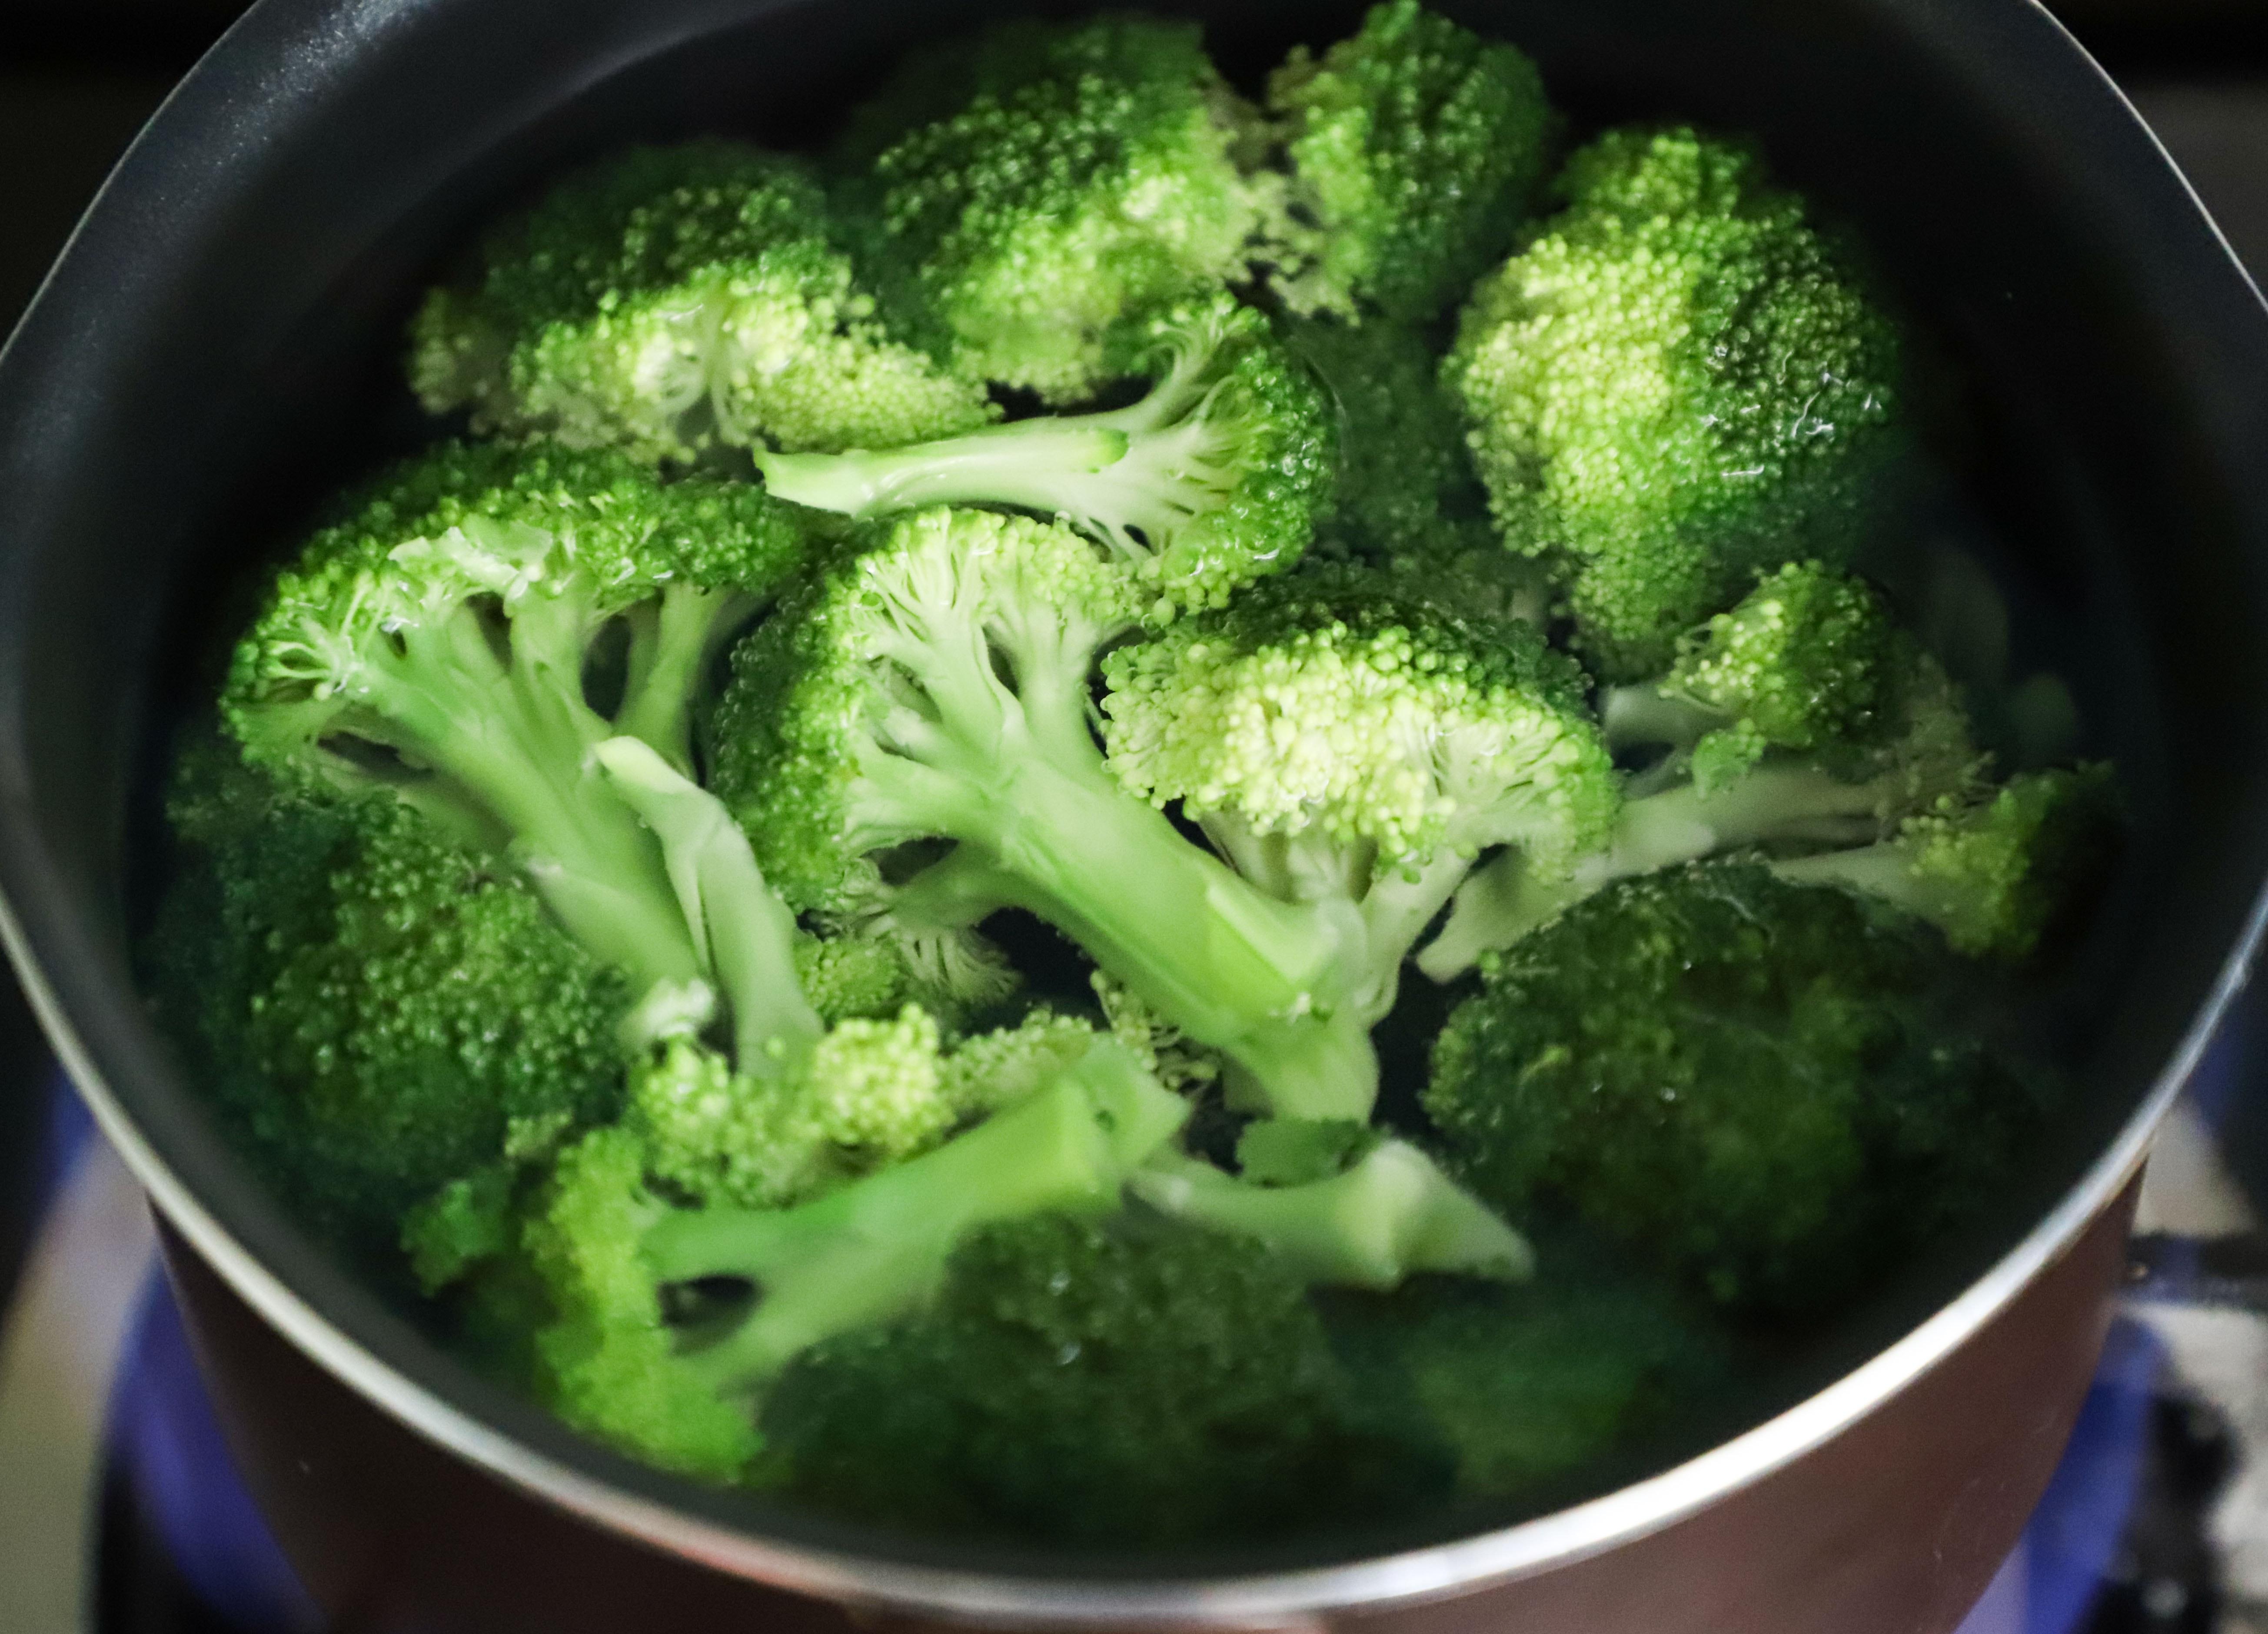 bowl-broccoli-cooking-1359326.jpg